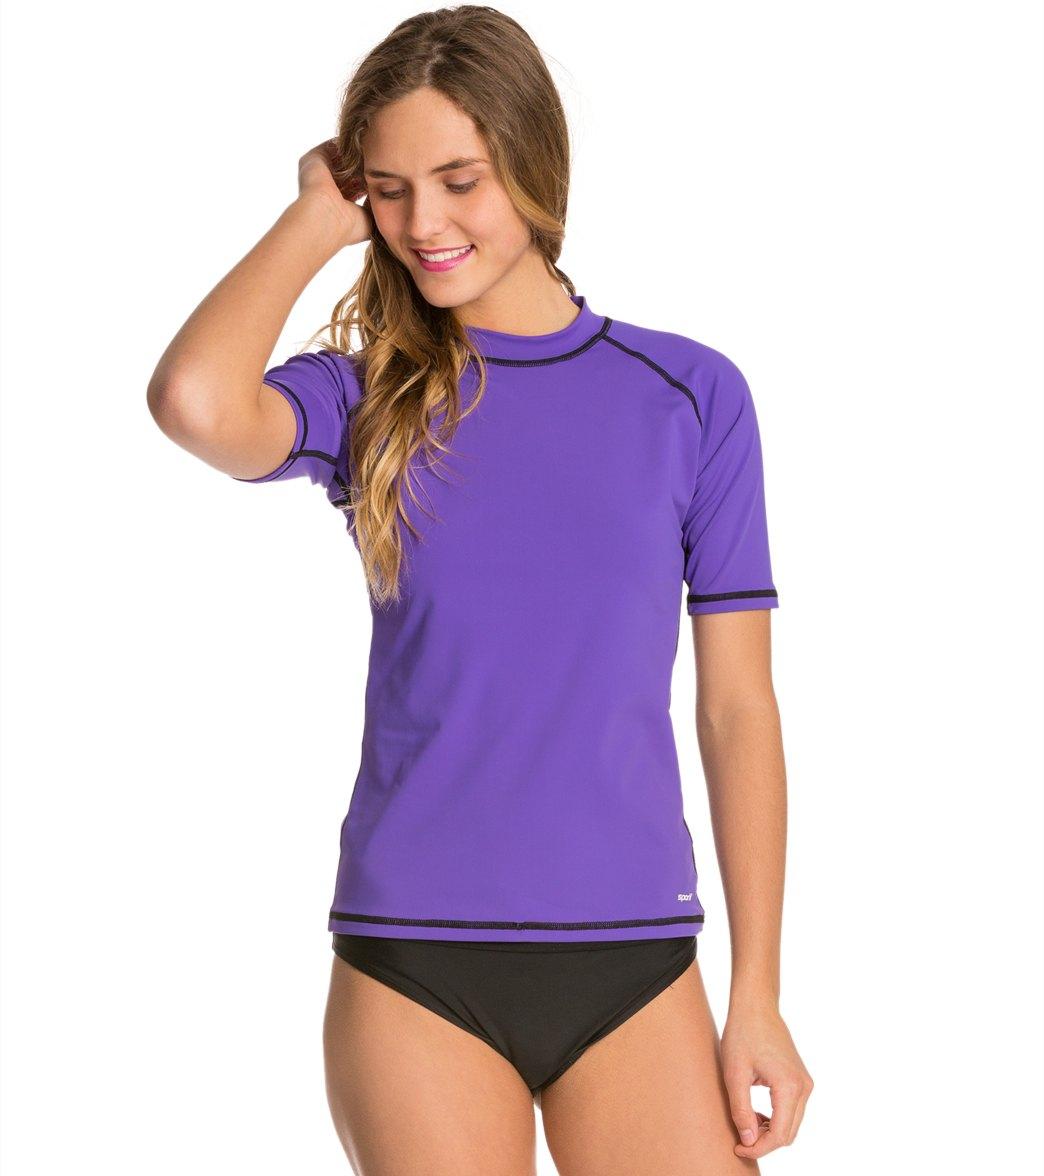 Designer Exercise Clothes For Women Over 50 Sporti Women s S S Swim Shirt